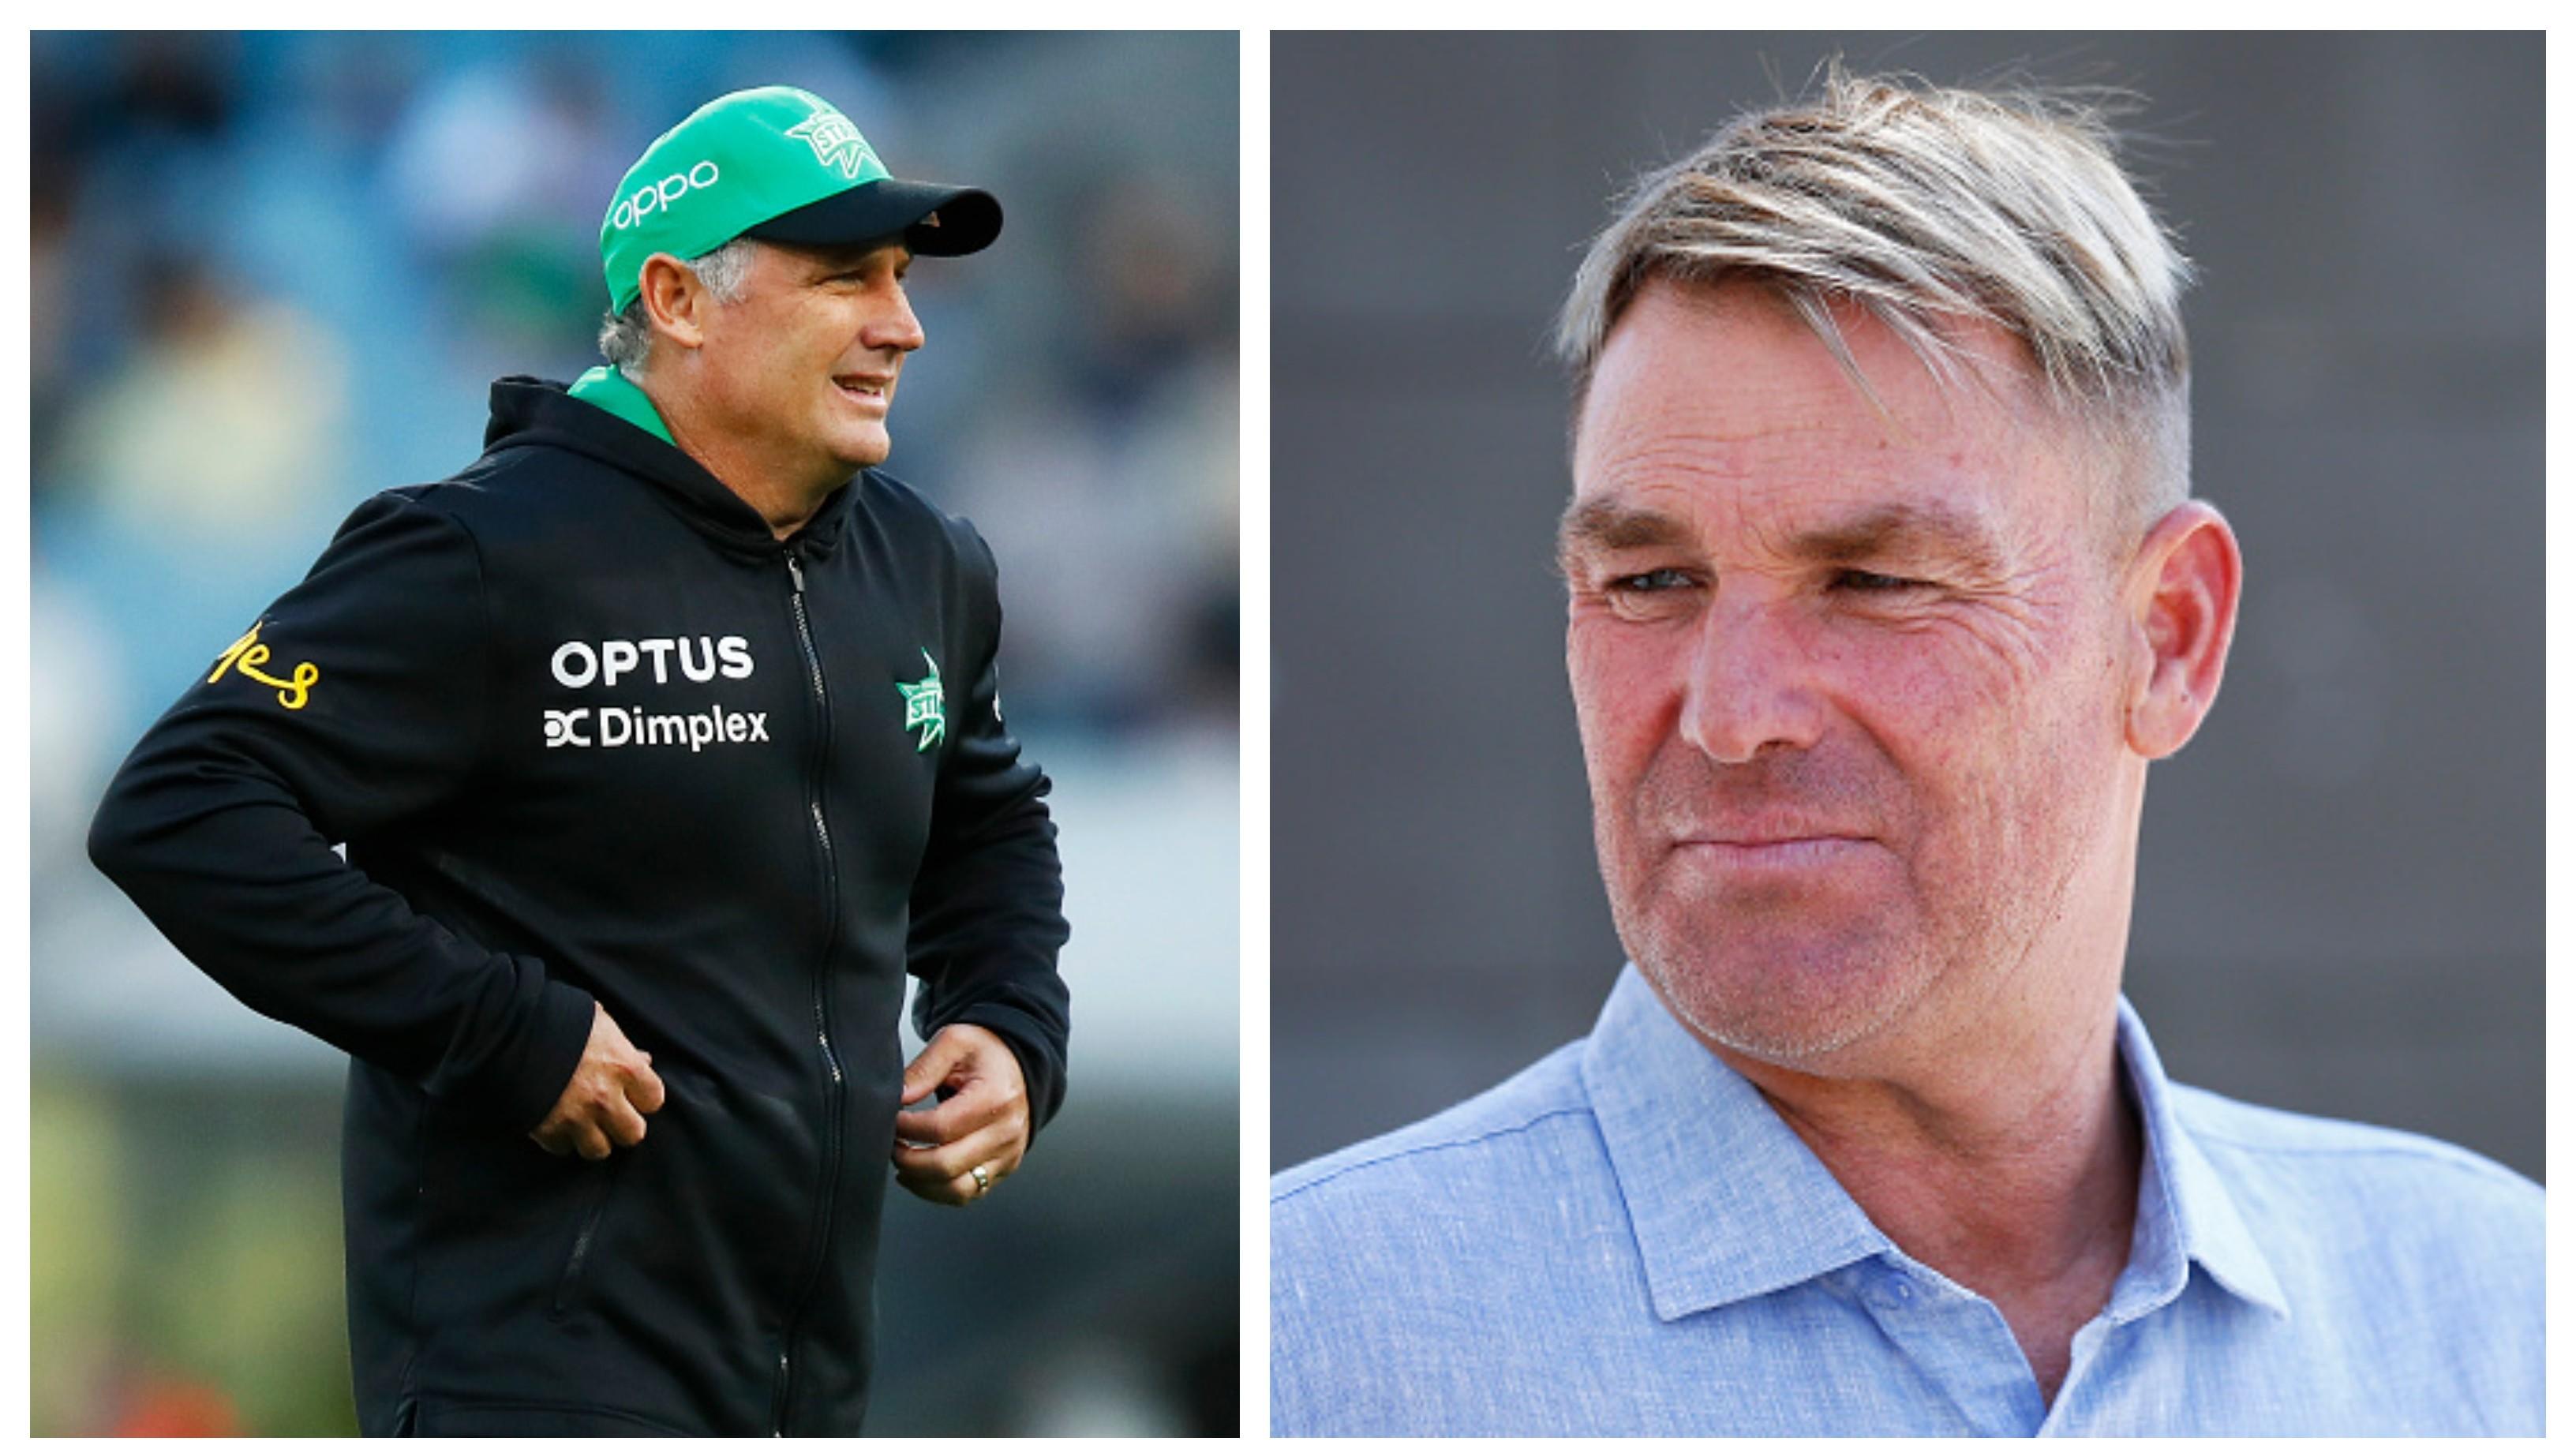 BBL 09: Shane Warne asks Cricket Australia to retract